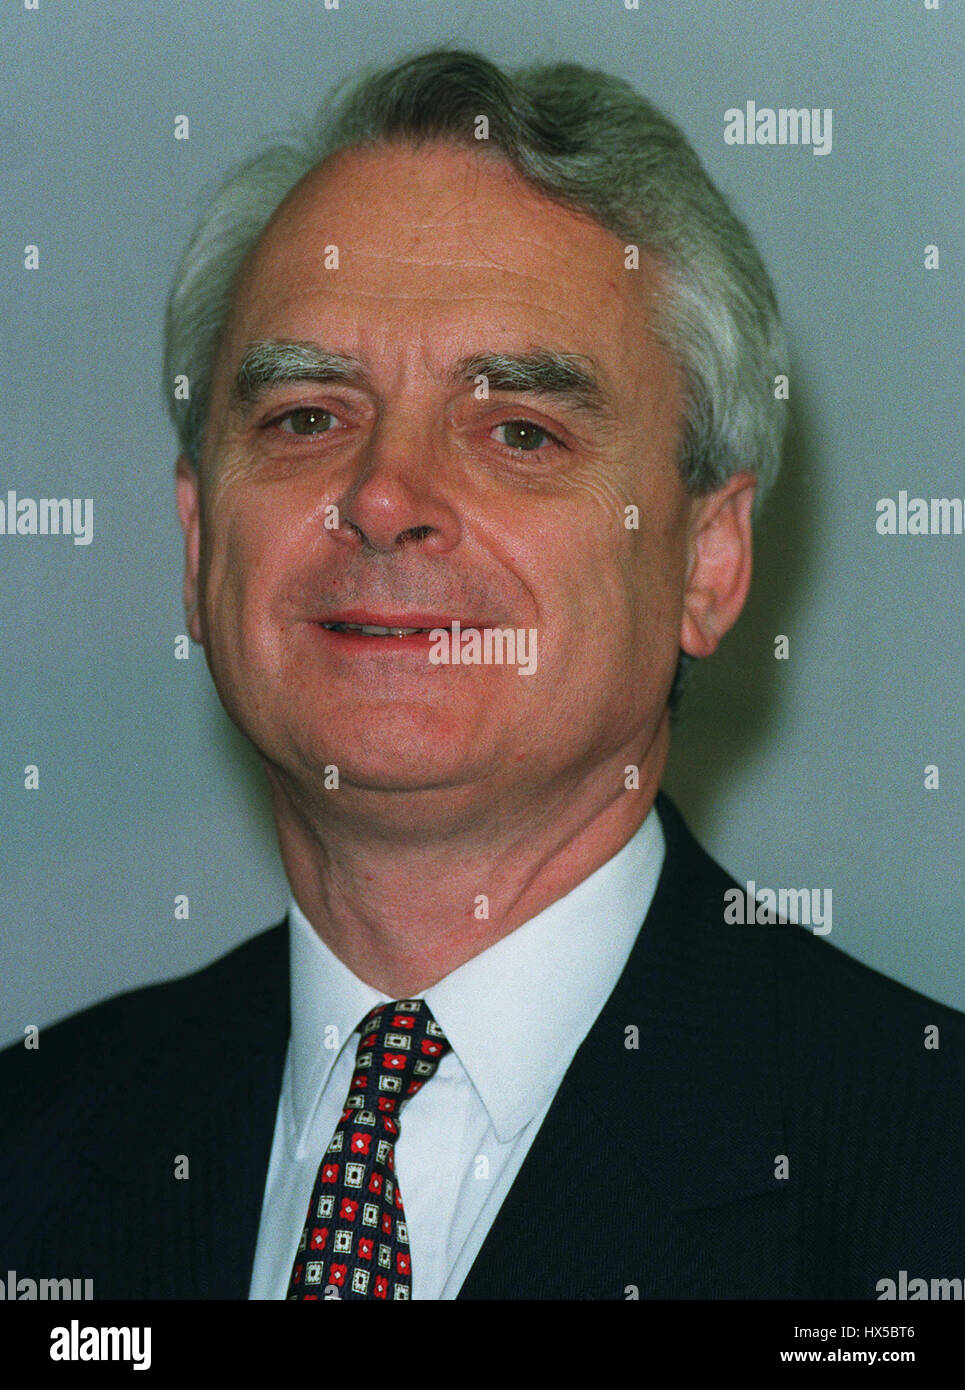 ROBERT MACLENNAN MP PRES. LIBERAL DEMOCRATS 20 October 1994 - Stock Image